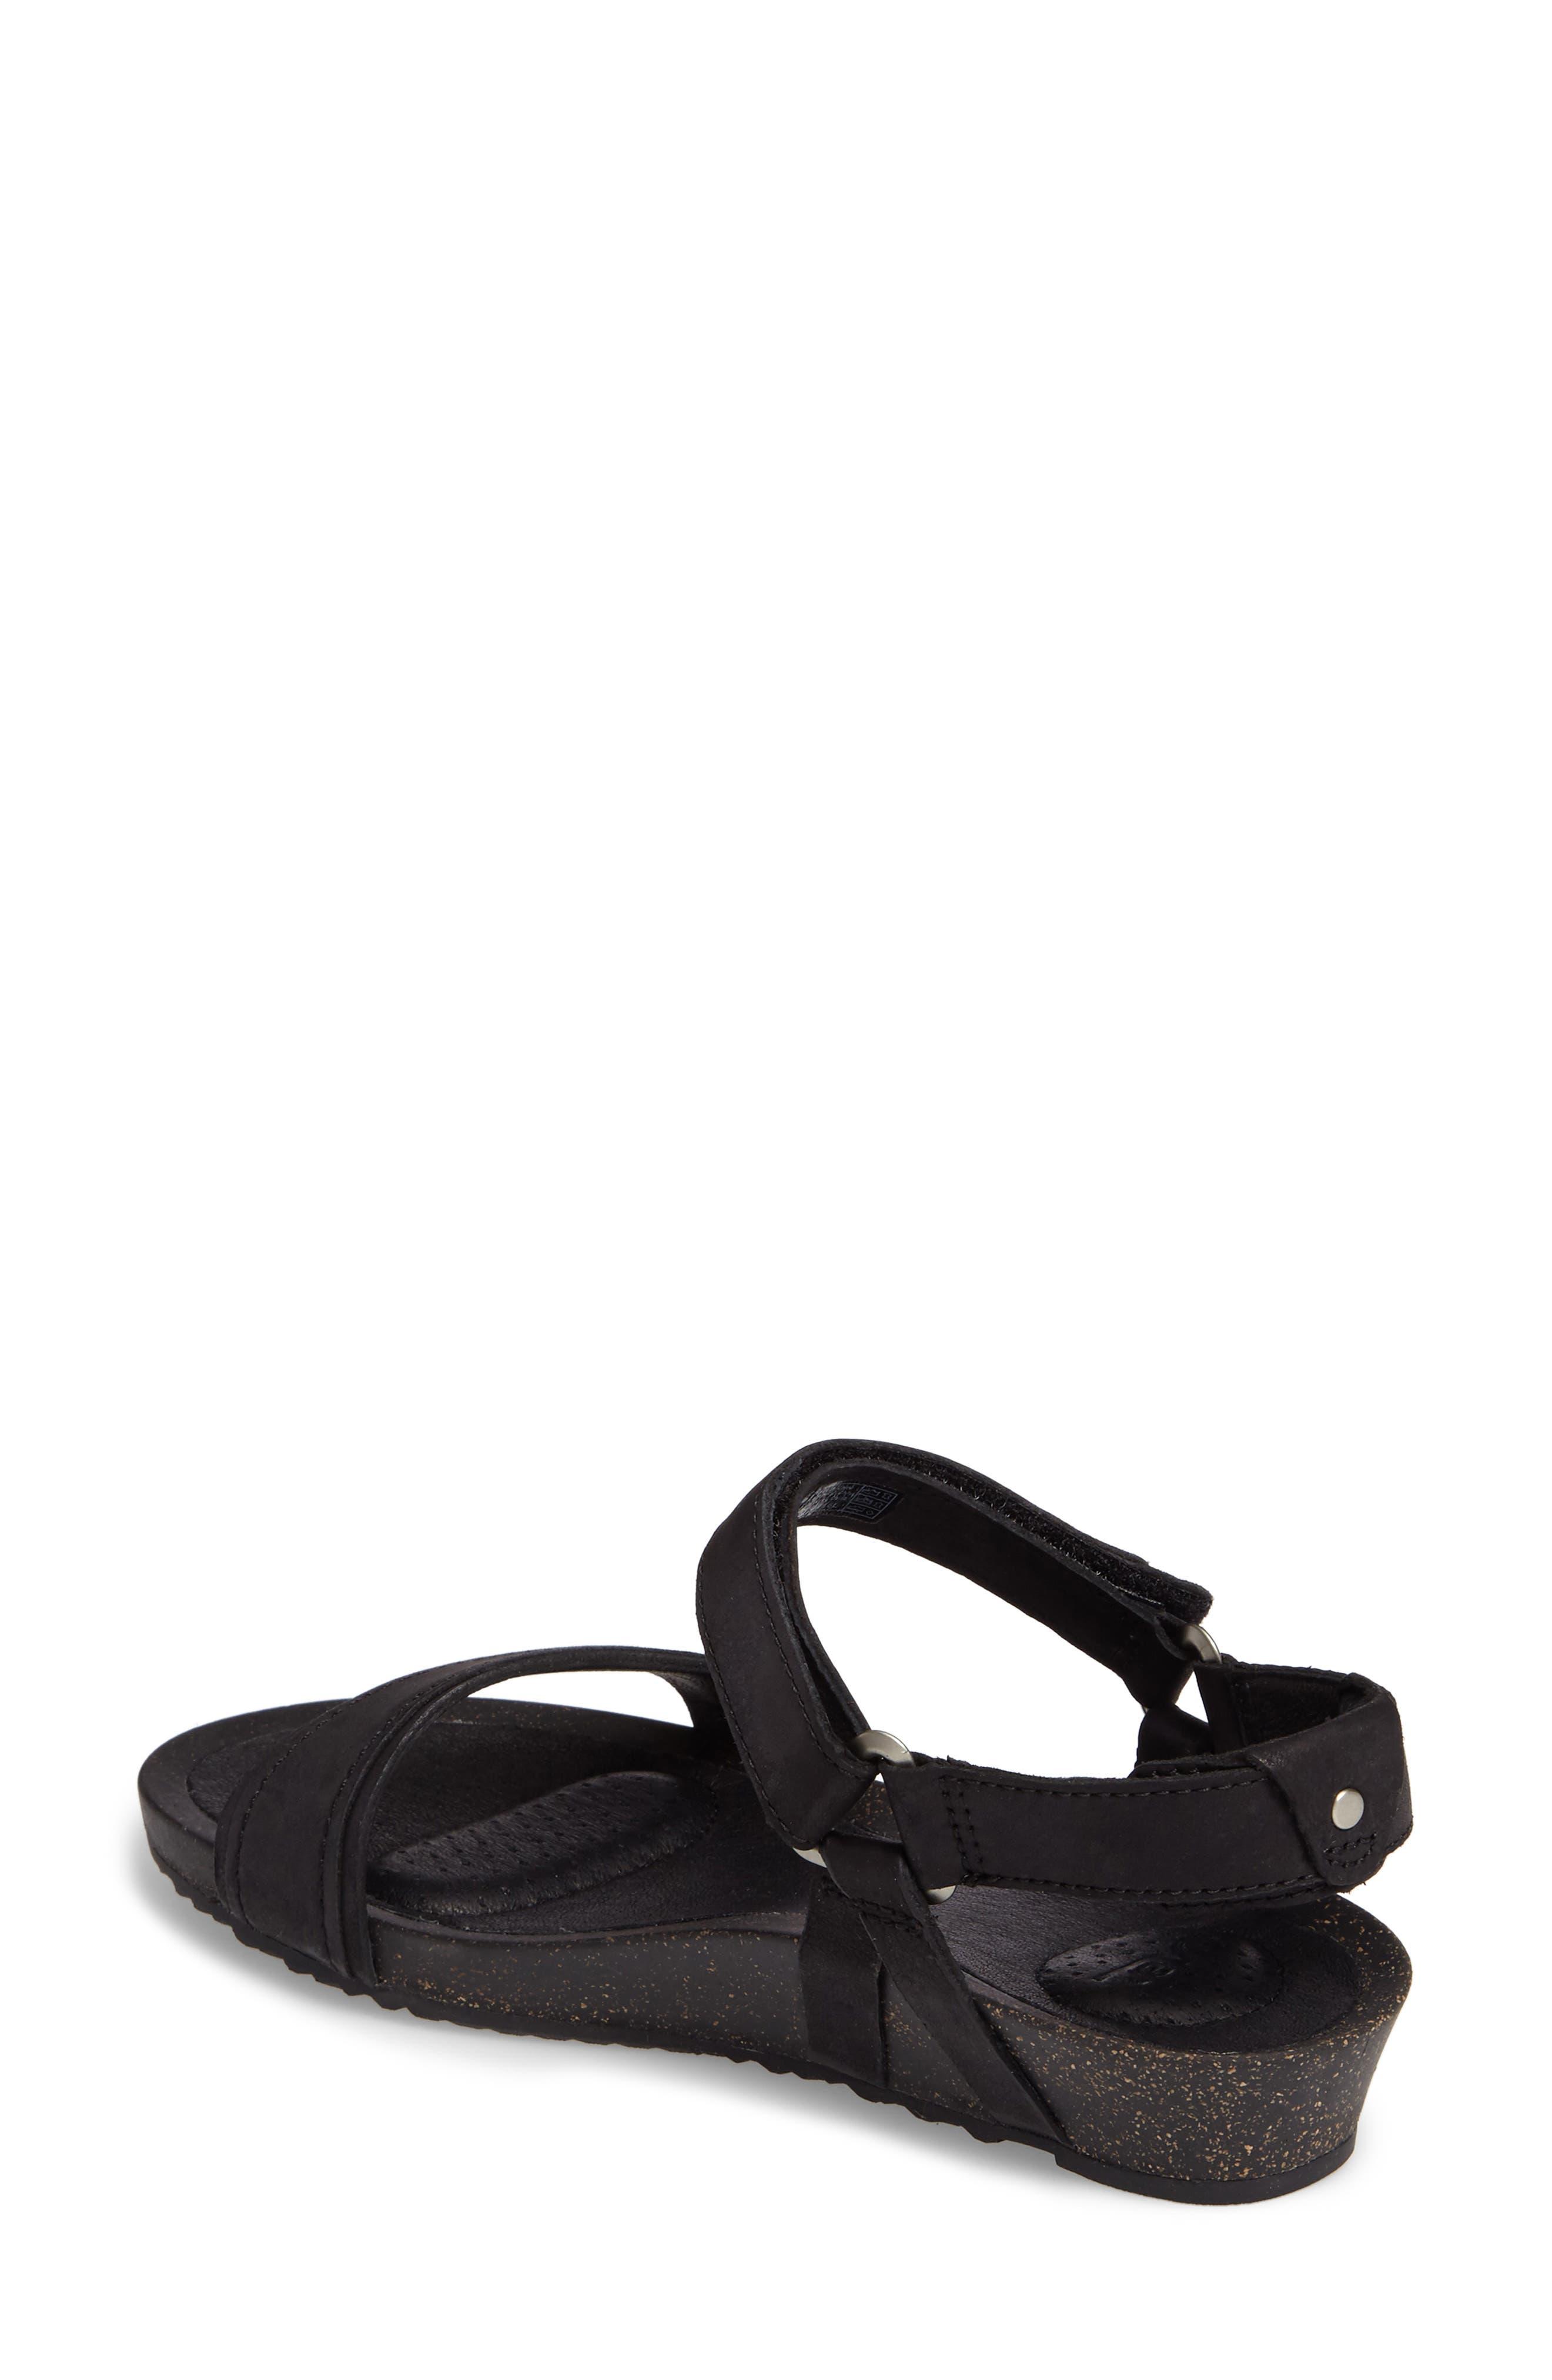 Alternate Image 2  - Teva Ysidro Stitch Sandal (Women)